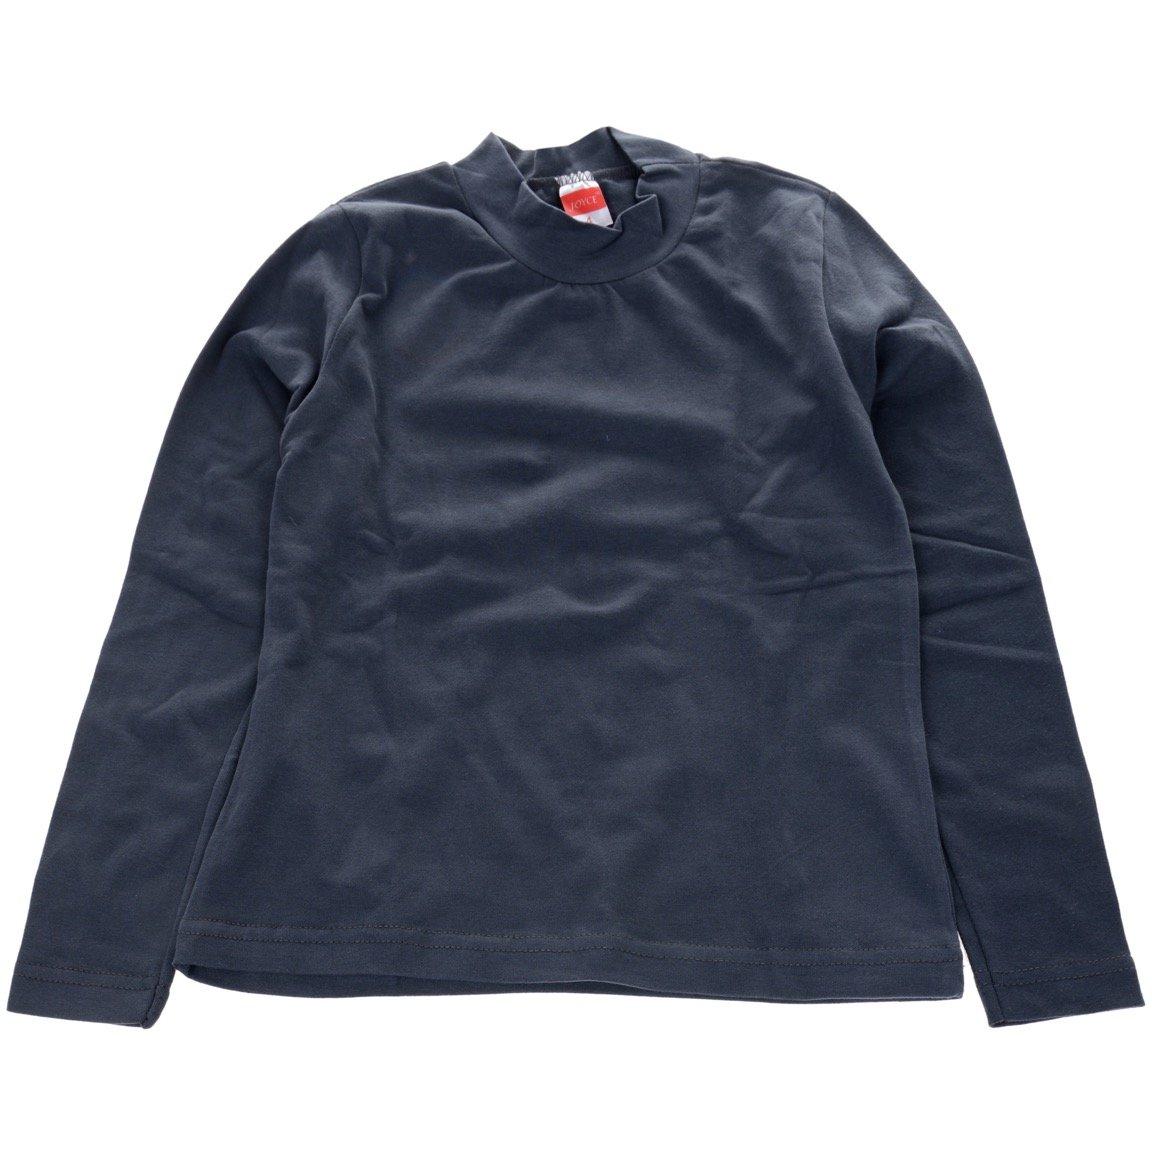 Joyce παιδική εποχιακή μπλούζα «Grey Stability»